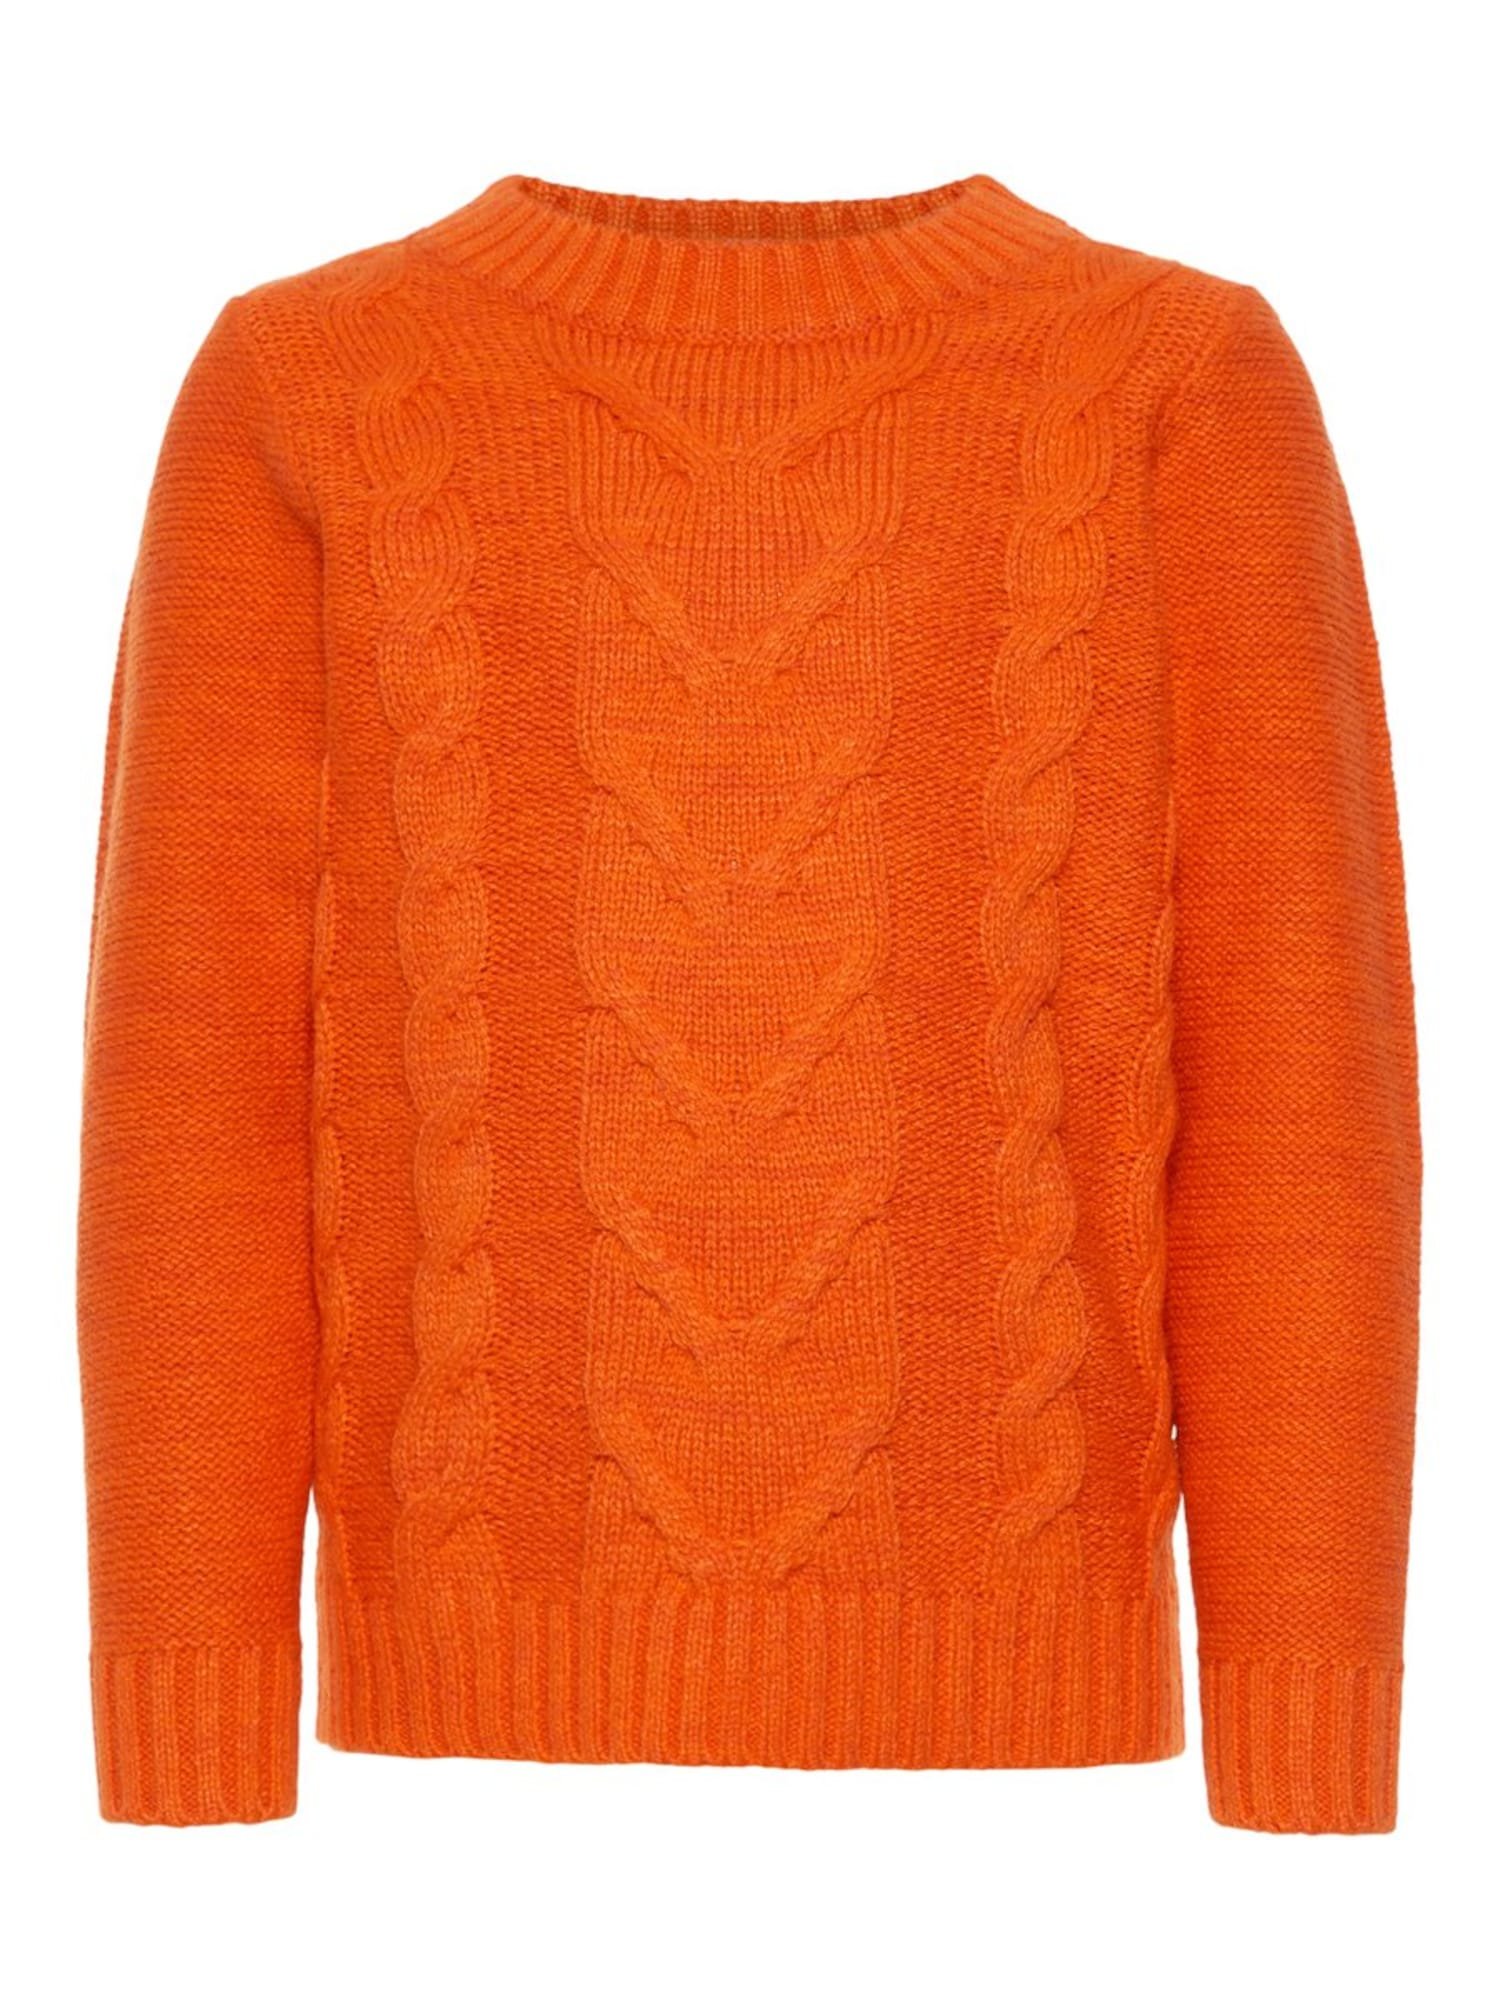 Miniboyoberteile - Pullover 'Nobert' - Onlineshop ABOUT YOU